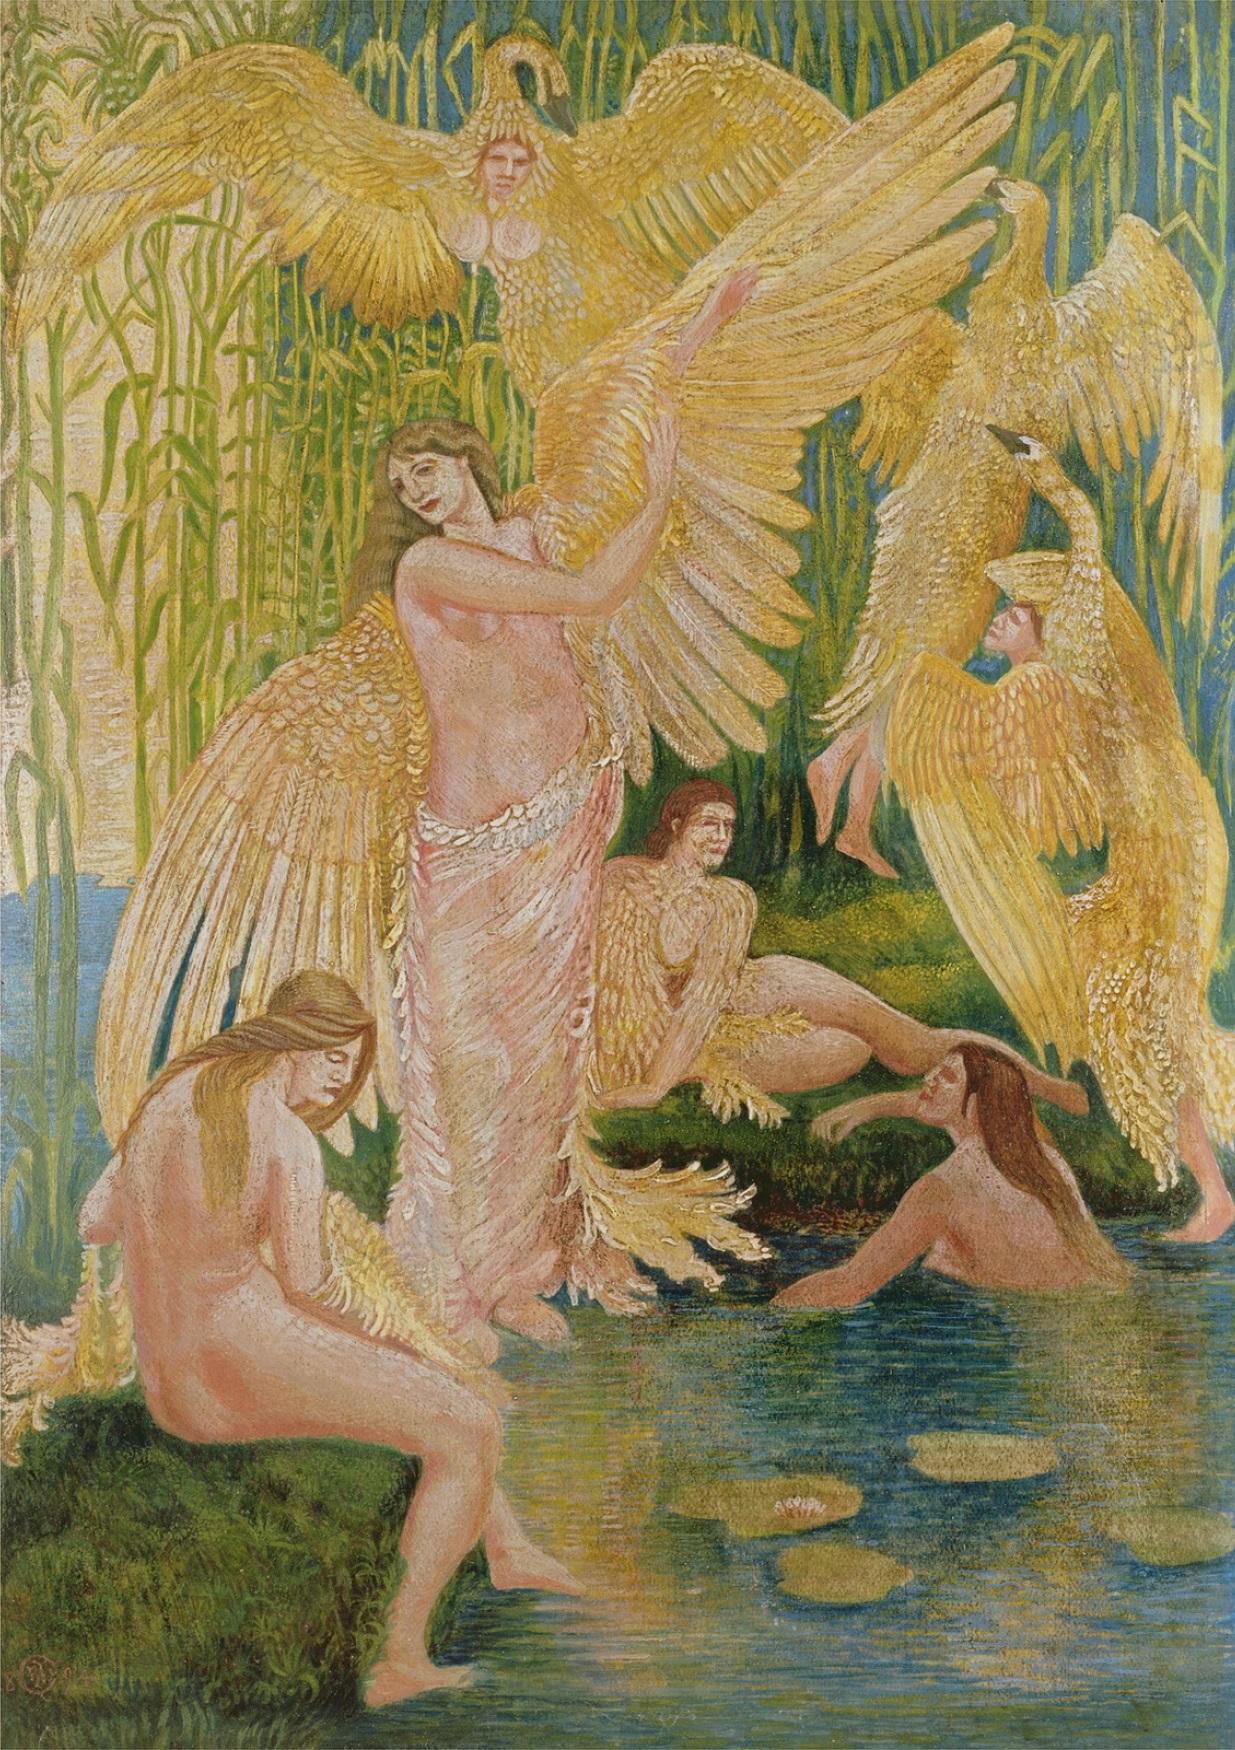 http://upload.wikimedia.org/wikipedia/commons/7/7f/The_Swan_Maidens_by_Walter_Crane_4.jpg